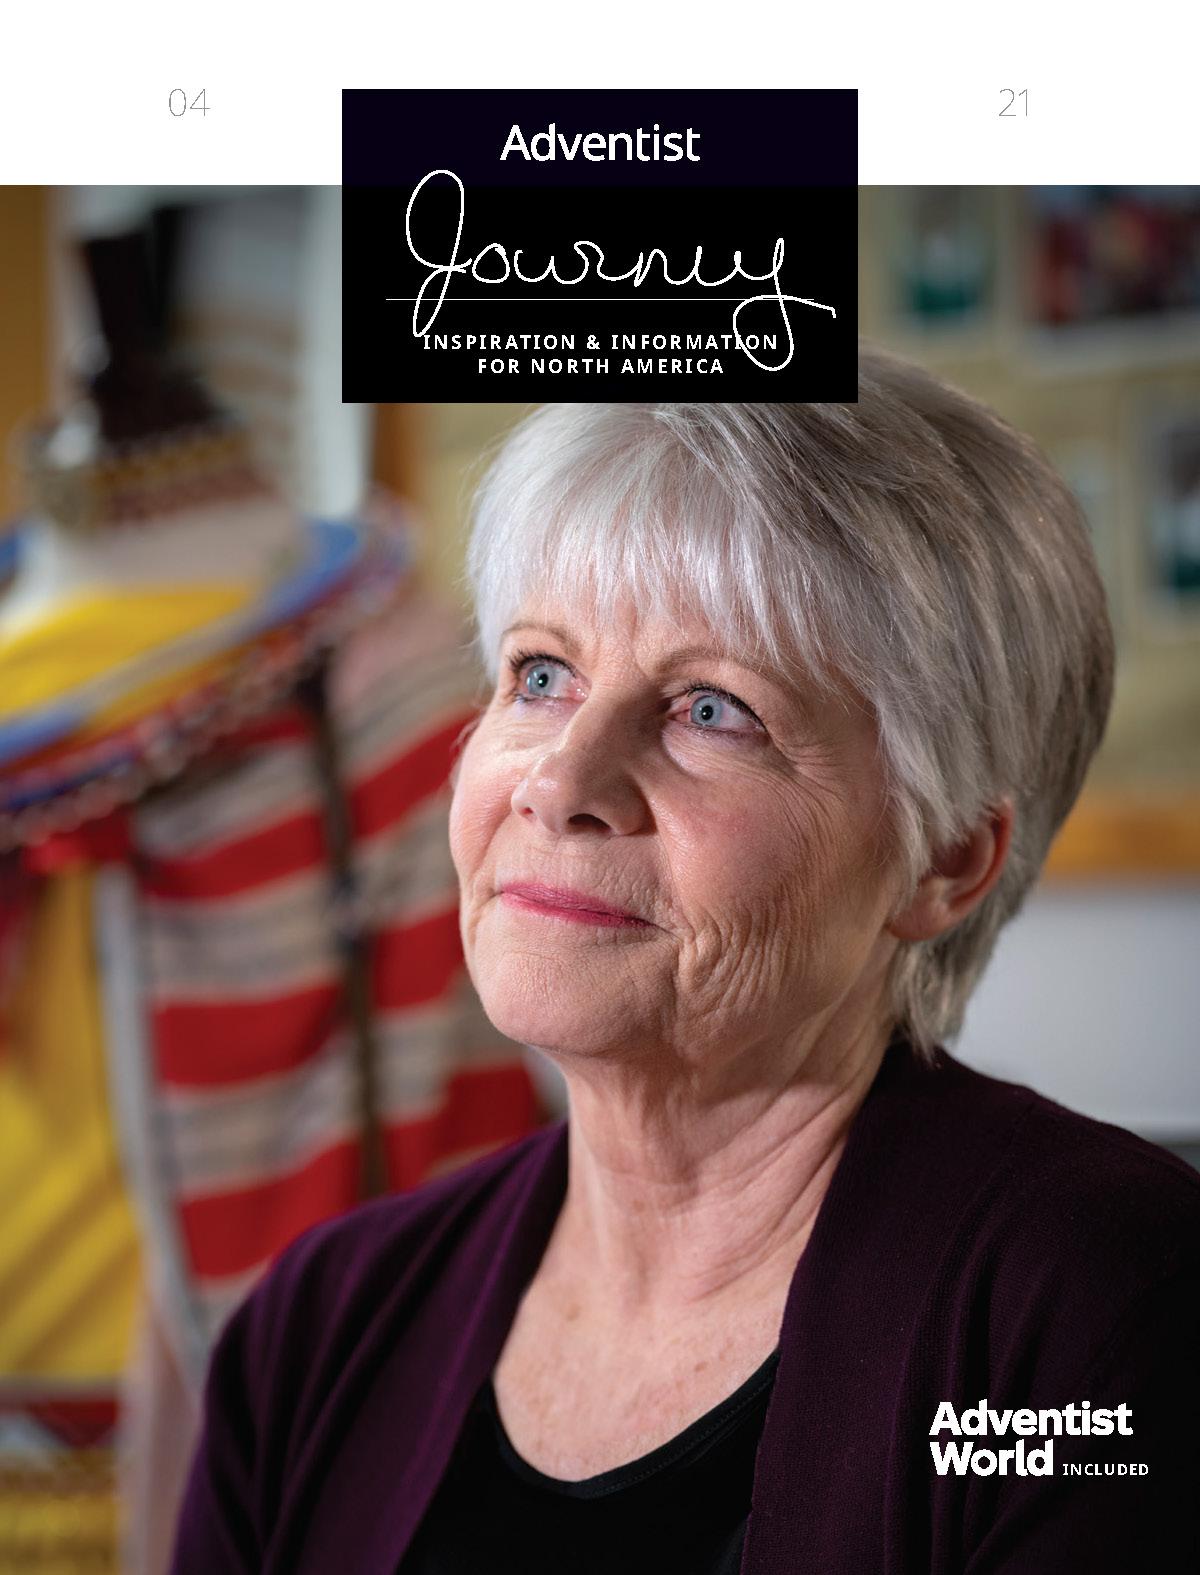 Adventist Journey magazine cover featuring Jan Latsha